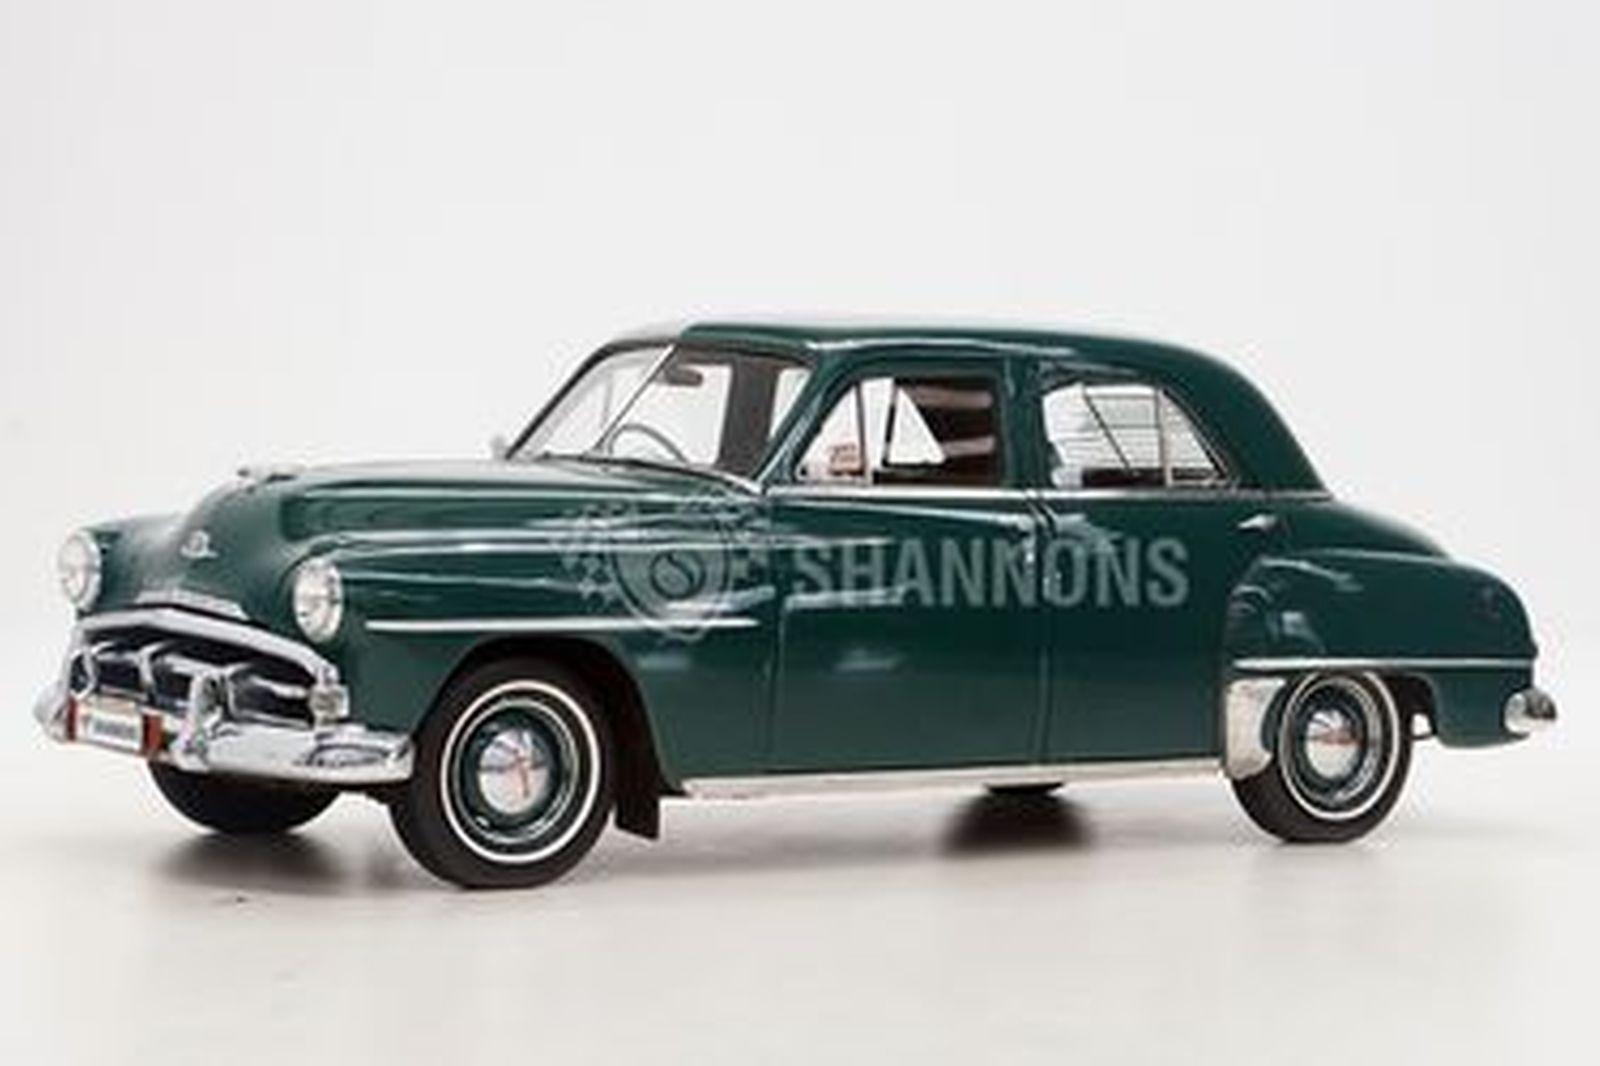 Plymouth Cranbrook Sedan (RHD)